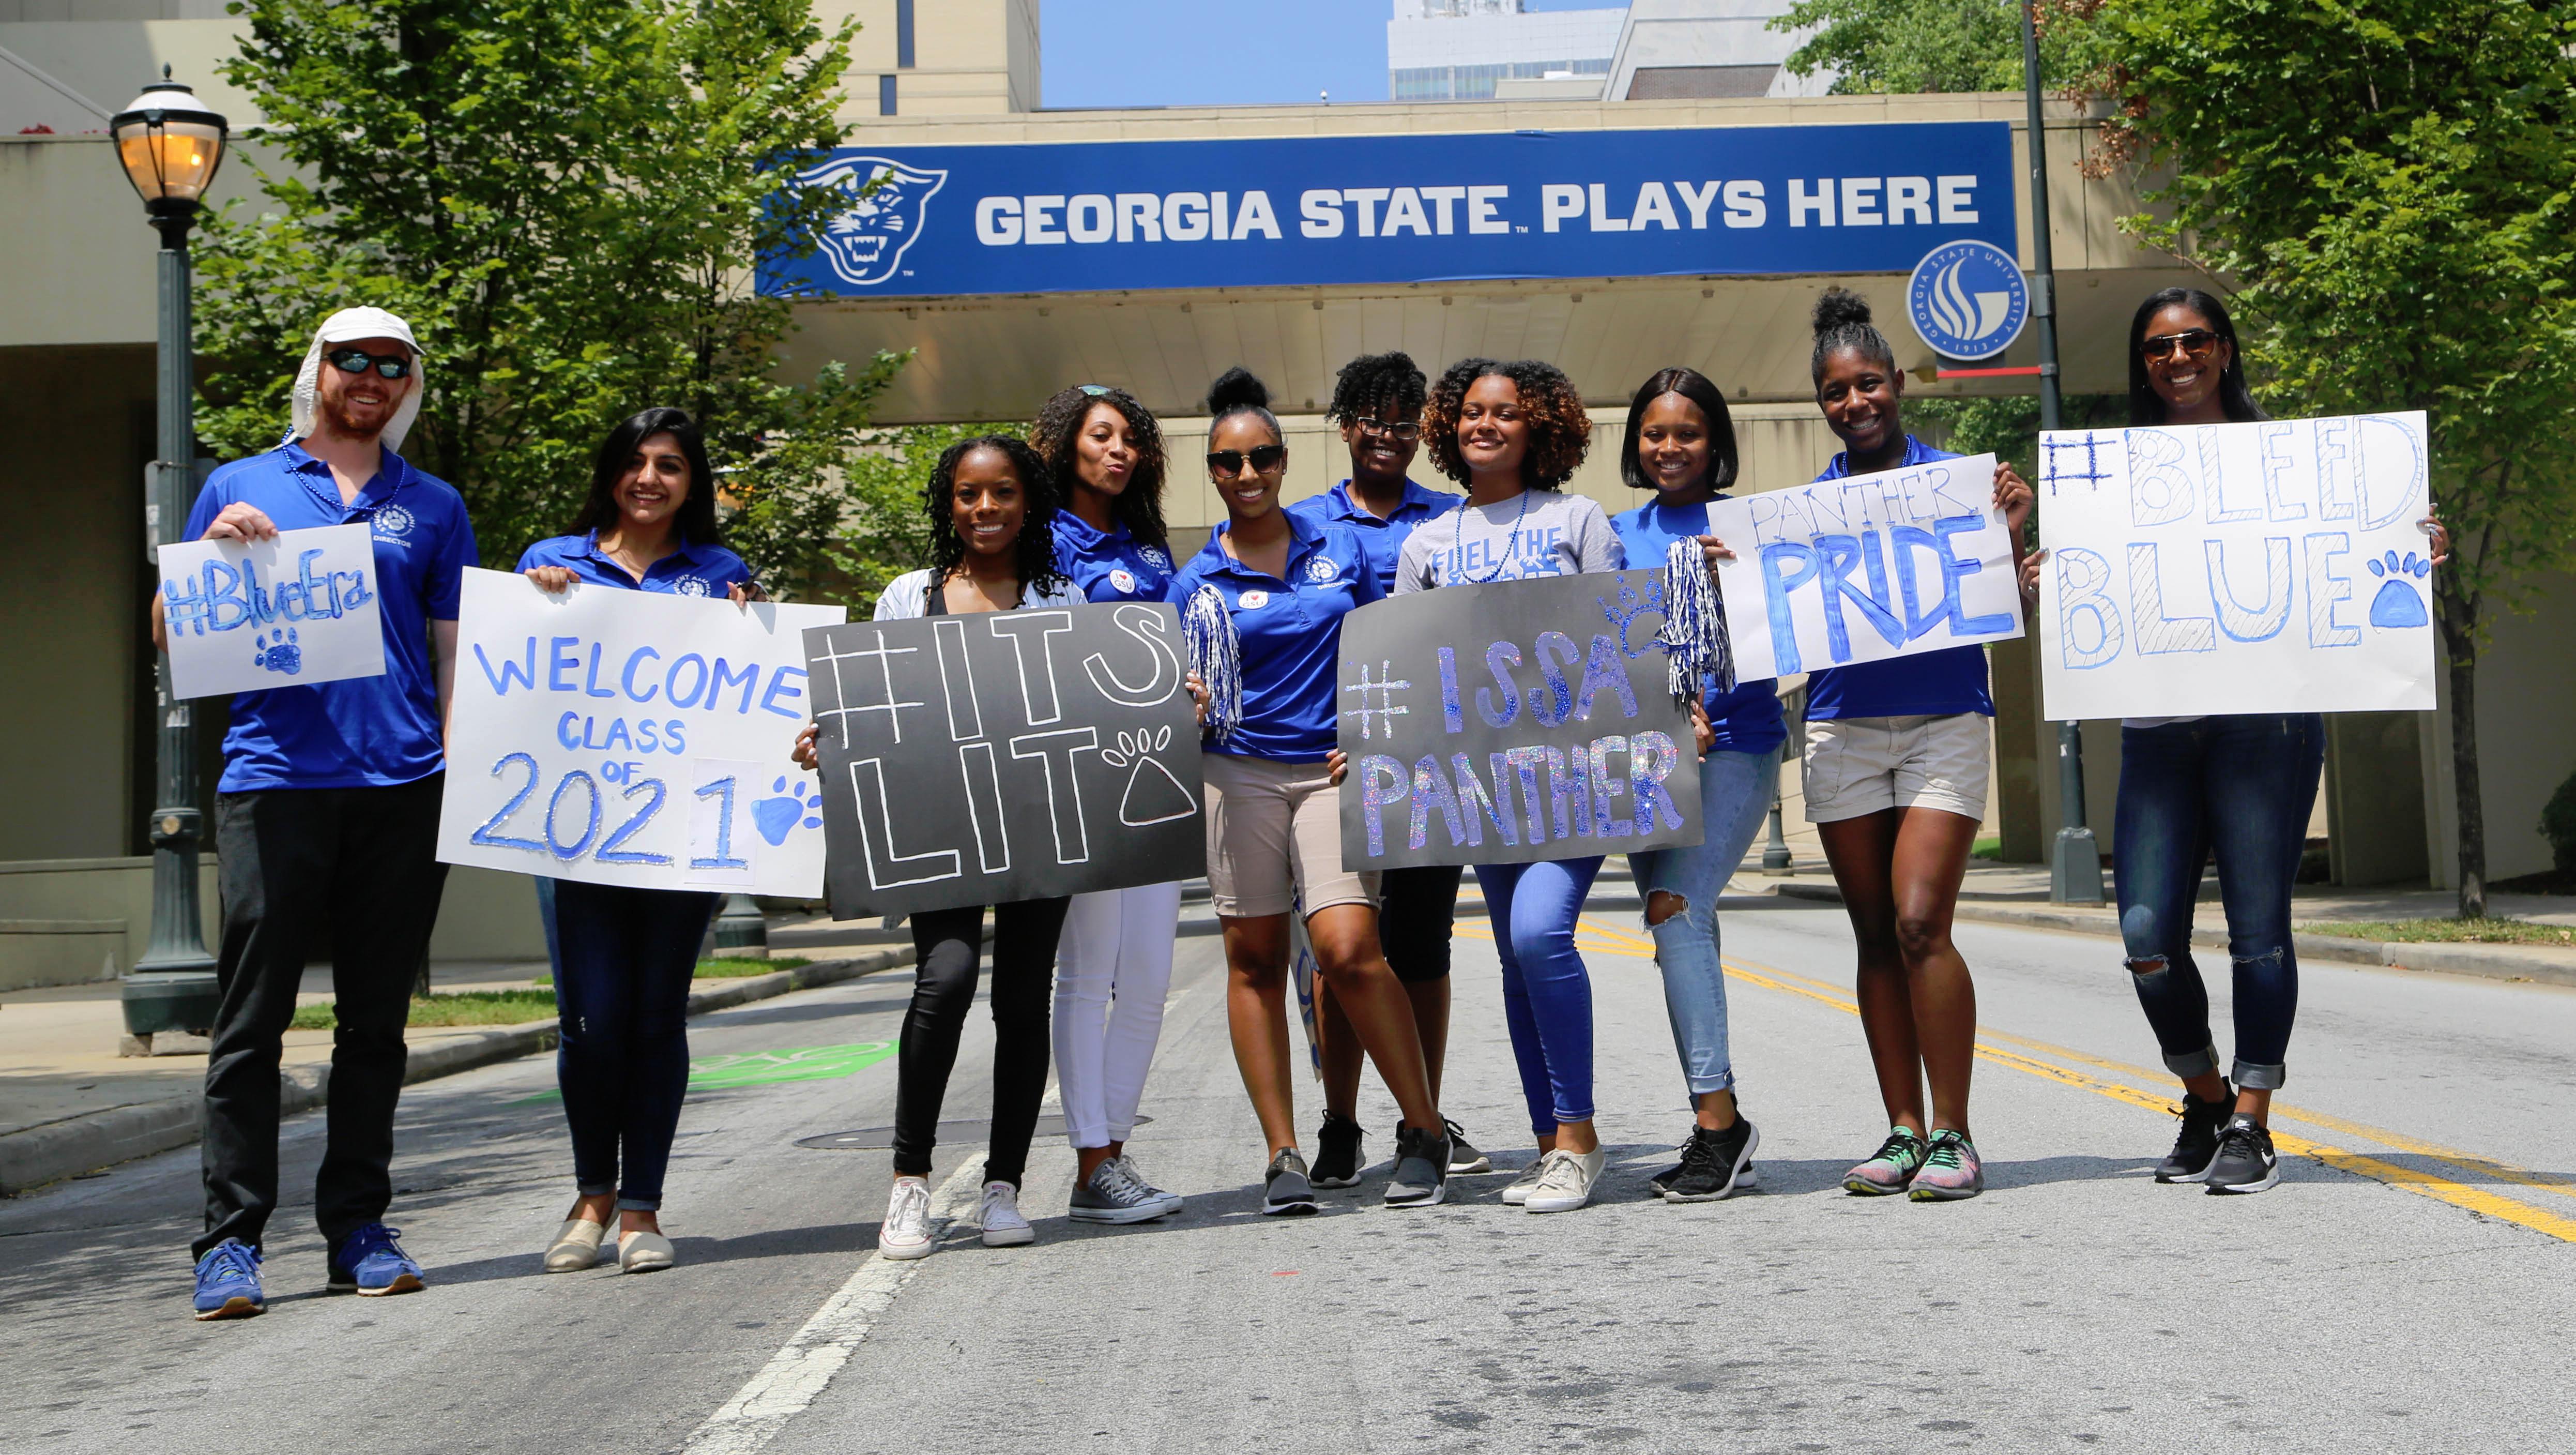 Gsu Alumni Association - Student Alumni Association With Regard To Georgia State University 2021 Calendar